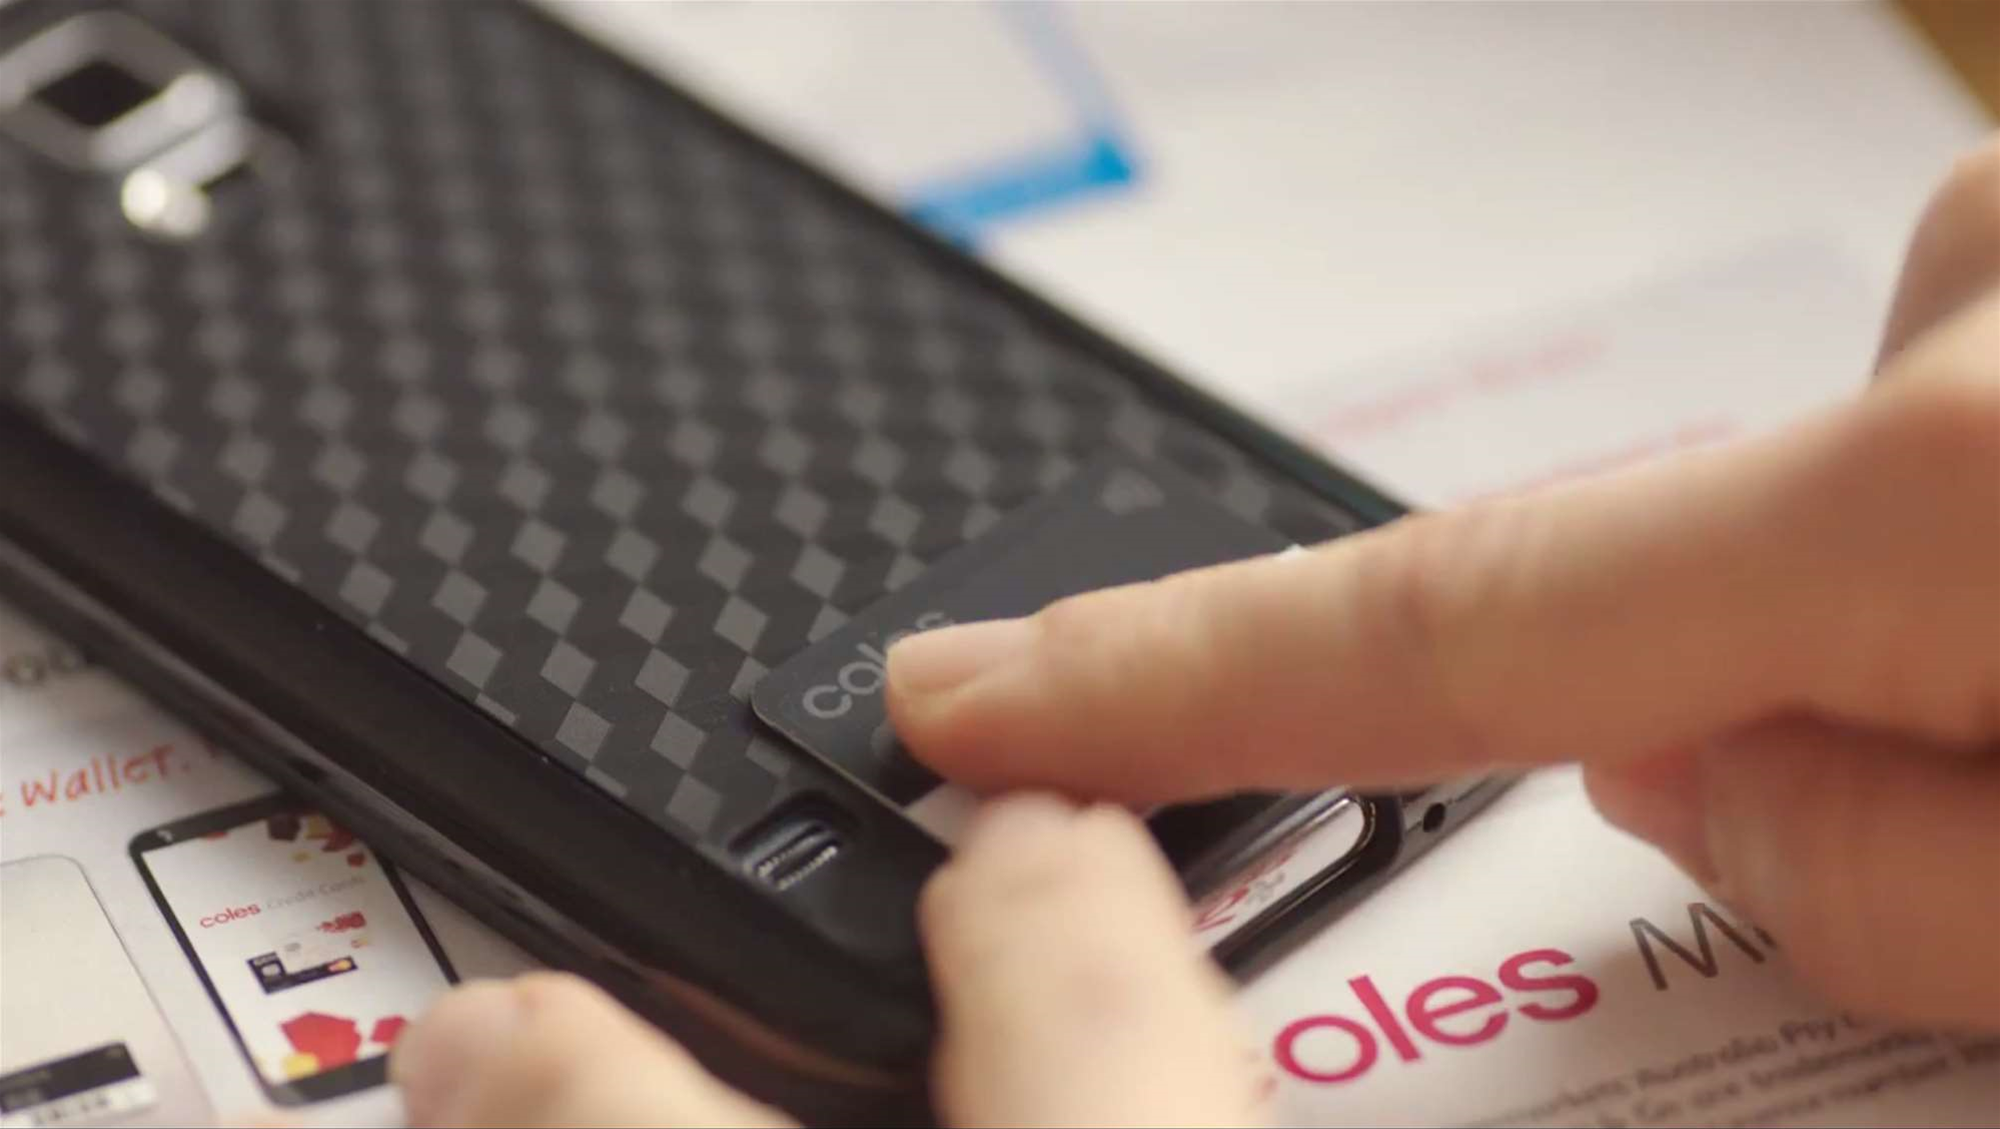 Coles launches a mobile wallet